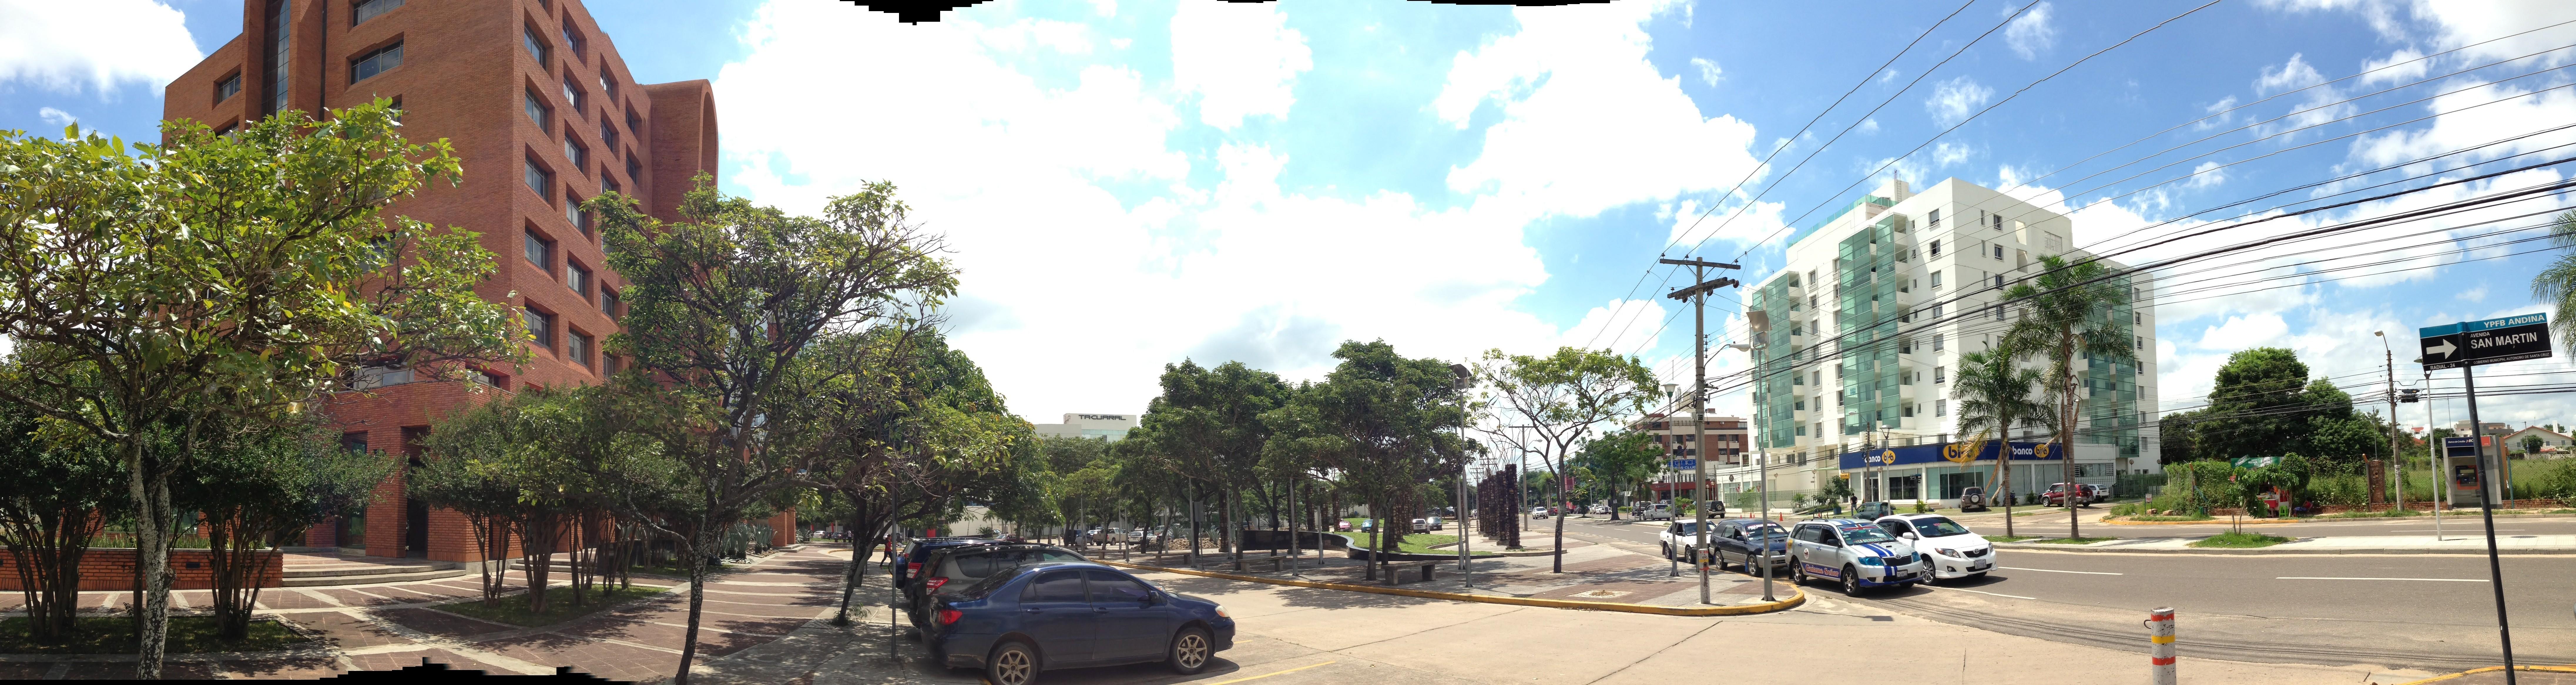 Parque Empresarial de Equipetrol